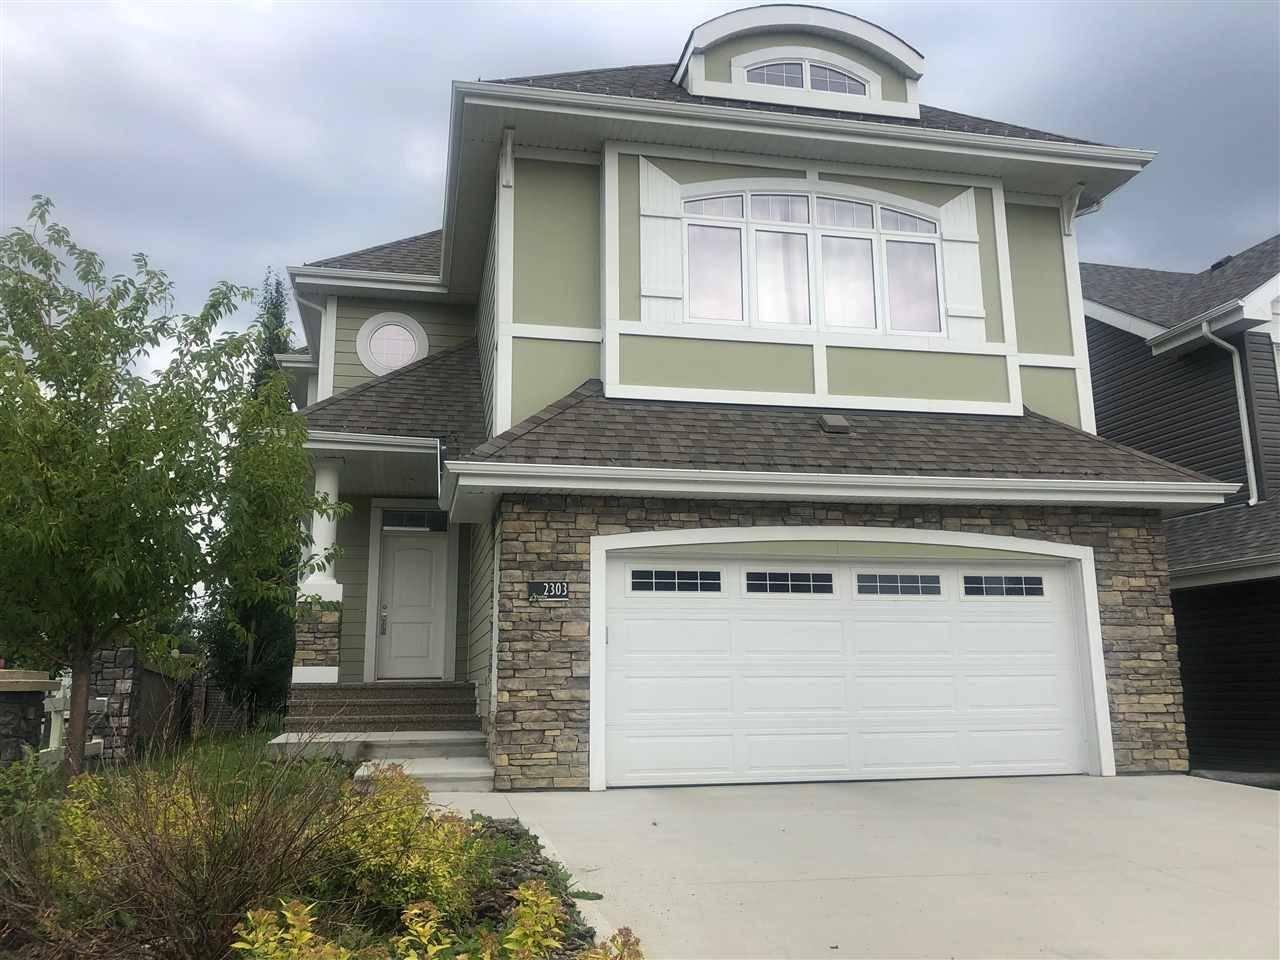 House for sale at 2303 Sparrow Cres Nw Edmonton Alberta - MLS: E4170071